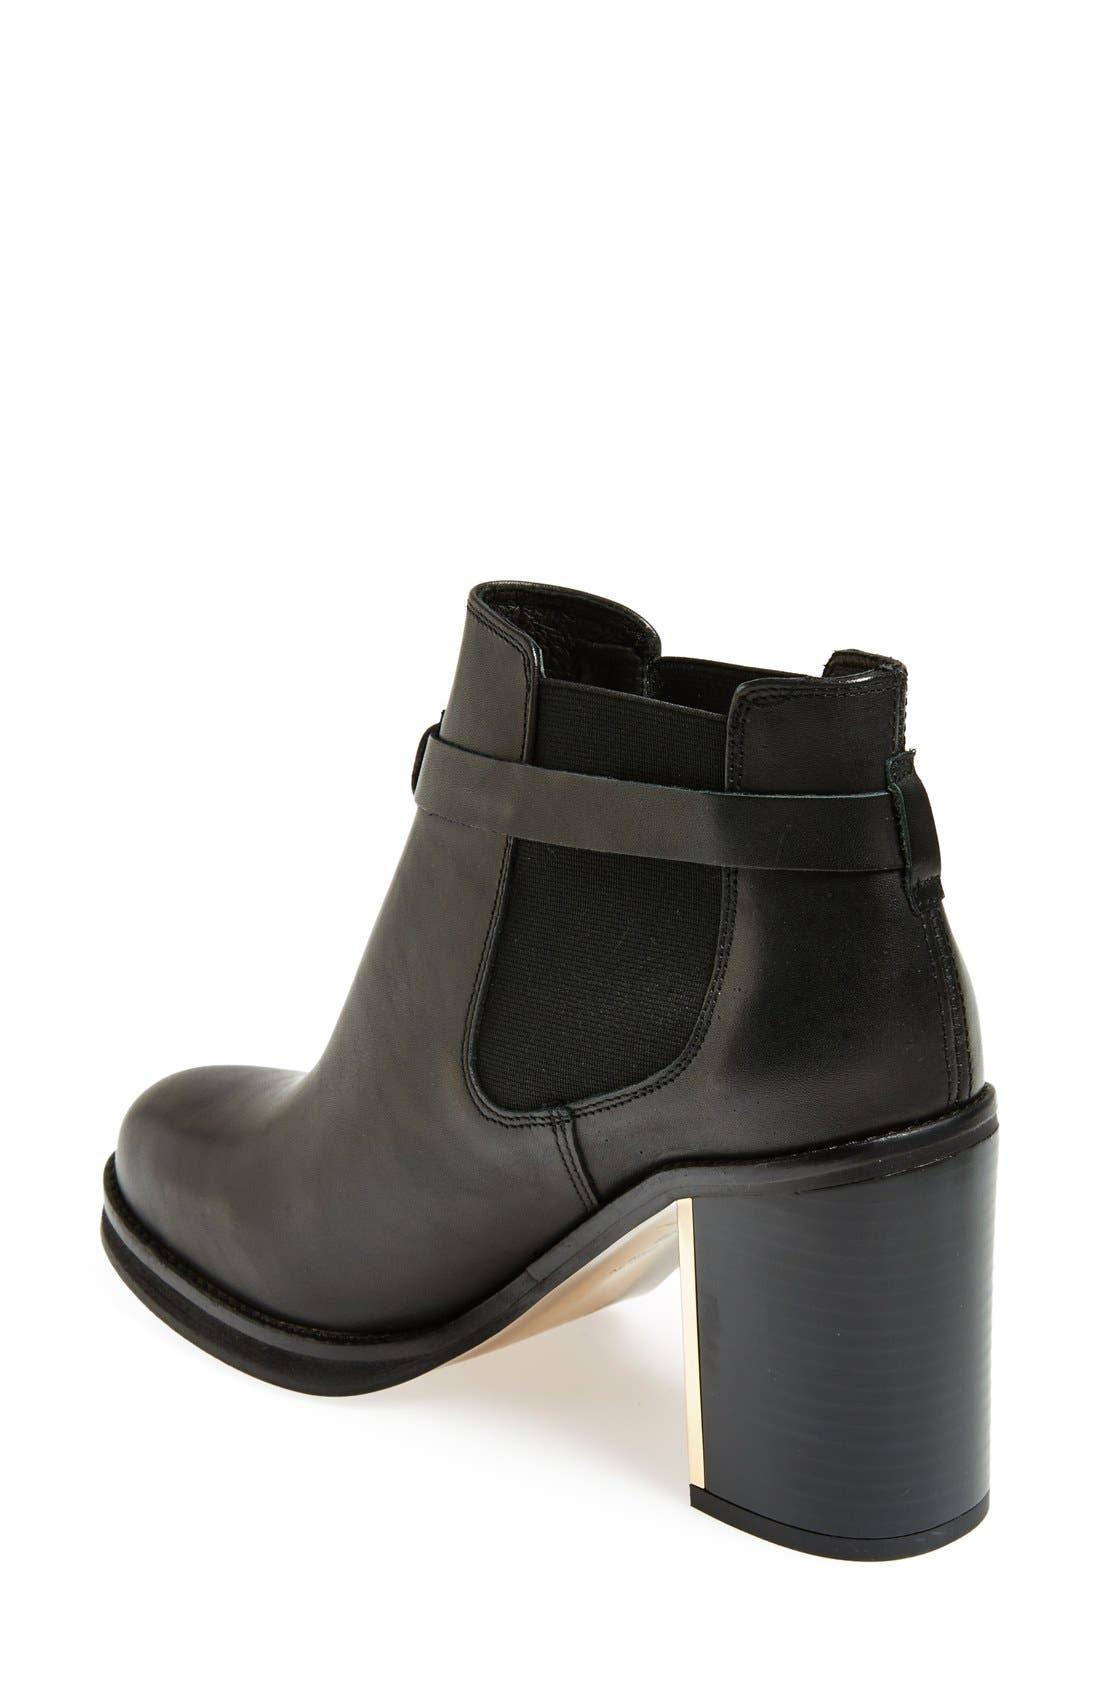 'Mine' Ankle Boot,                             Alternate thumbnail 2, color,                             001